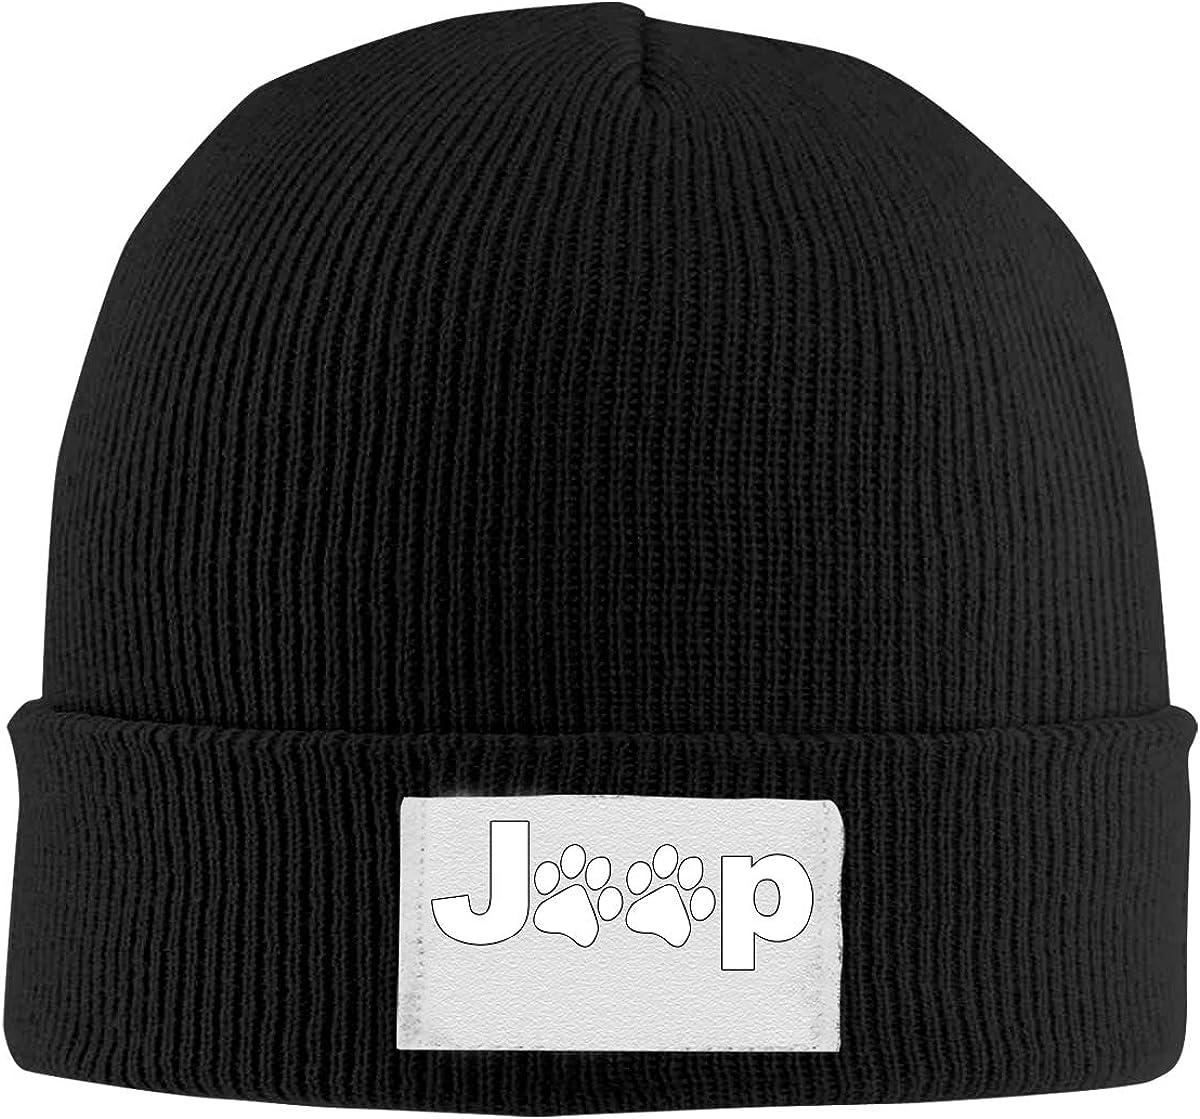 White SHORT VISOR BEANIE JEEP HAT Knit Jeep Cap Warm Winter skull ski snowboard